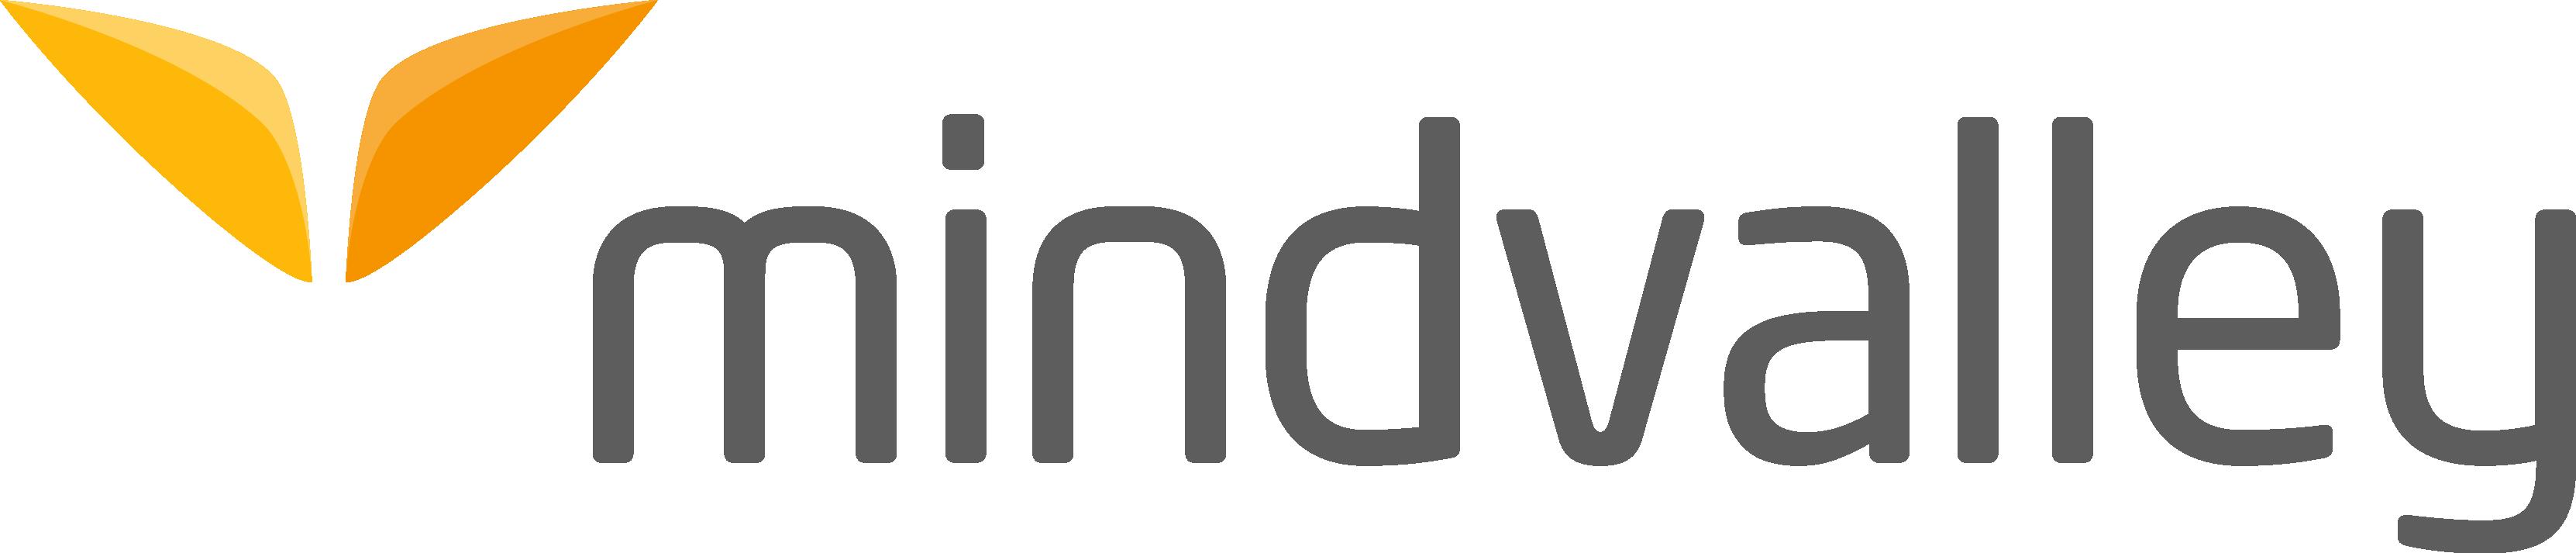 mv-logo-hori-1.png